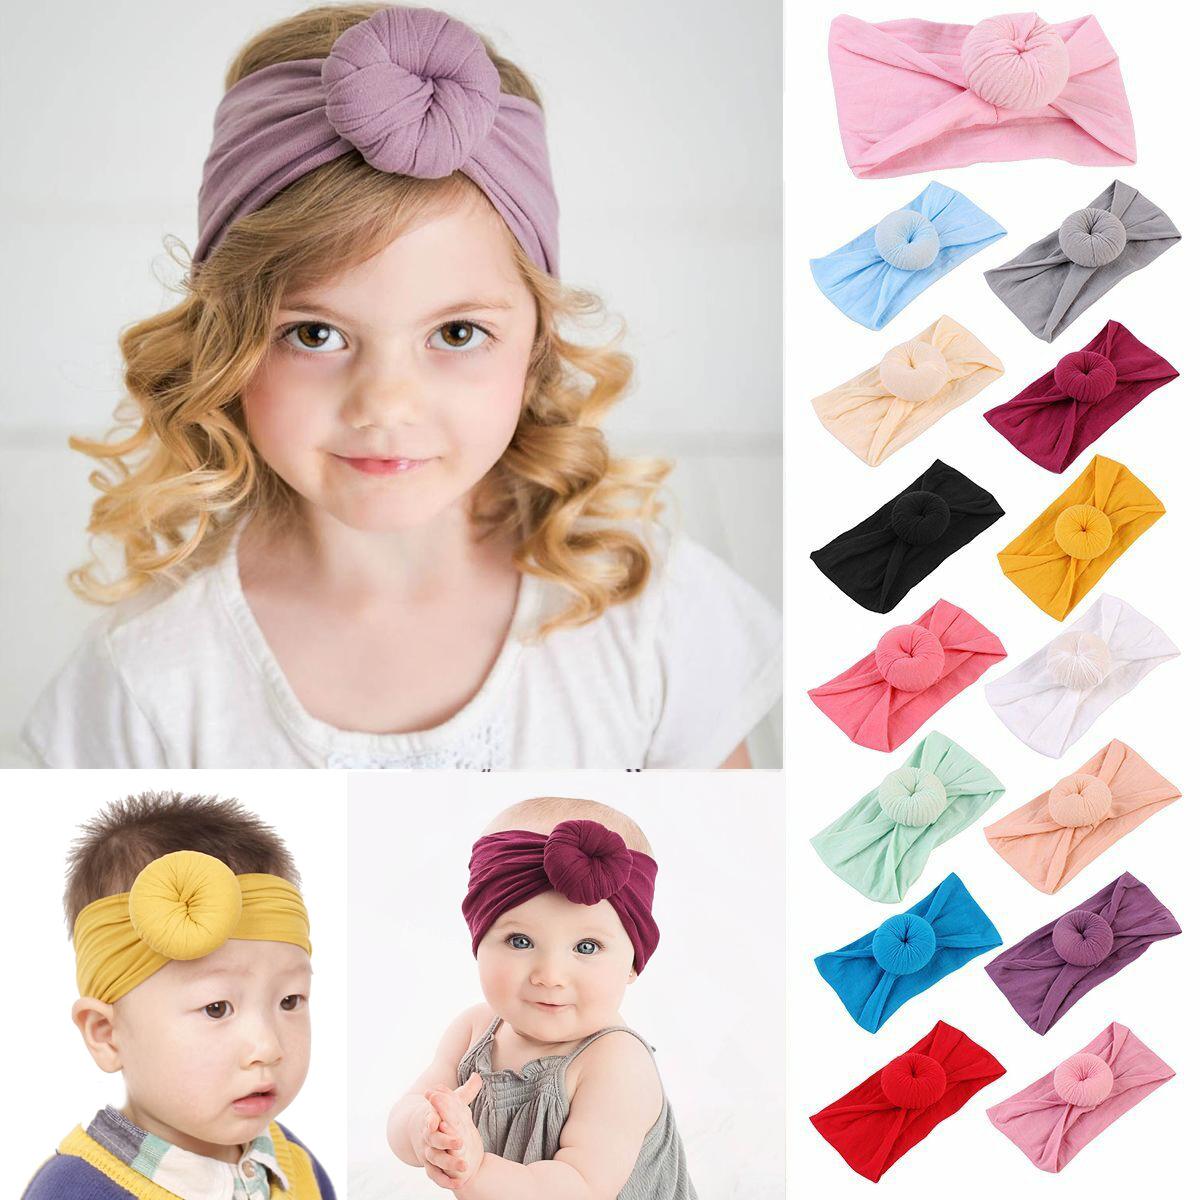 Children Kids Girls Baby Toddler Hair Bow Knot Headband Hair Band Headwear